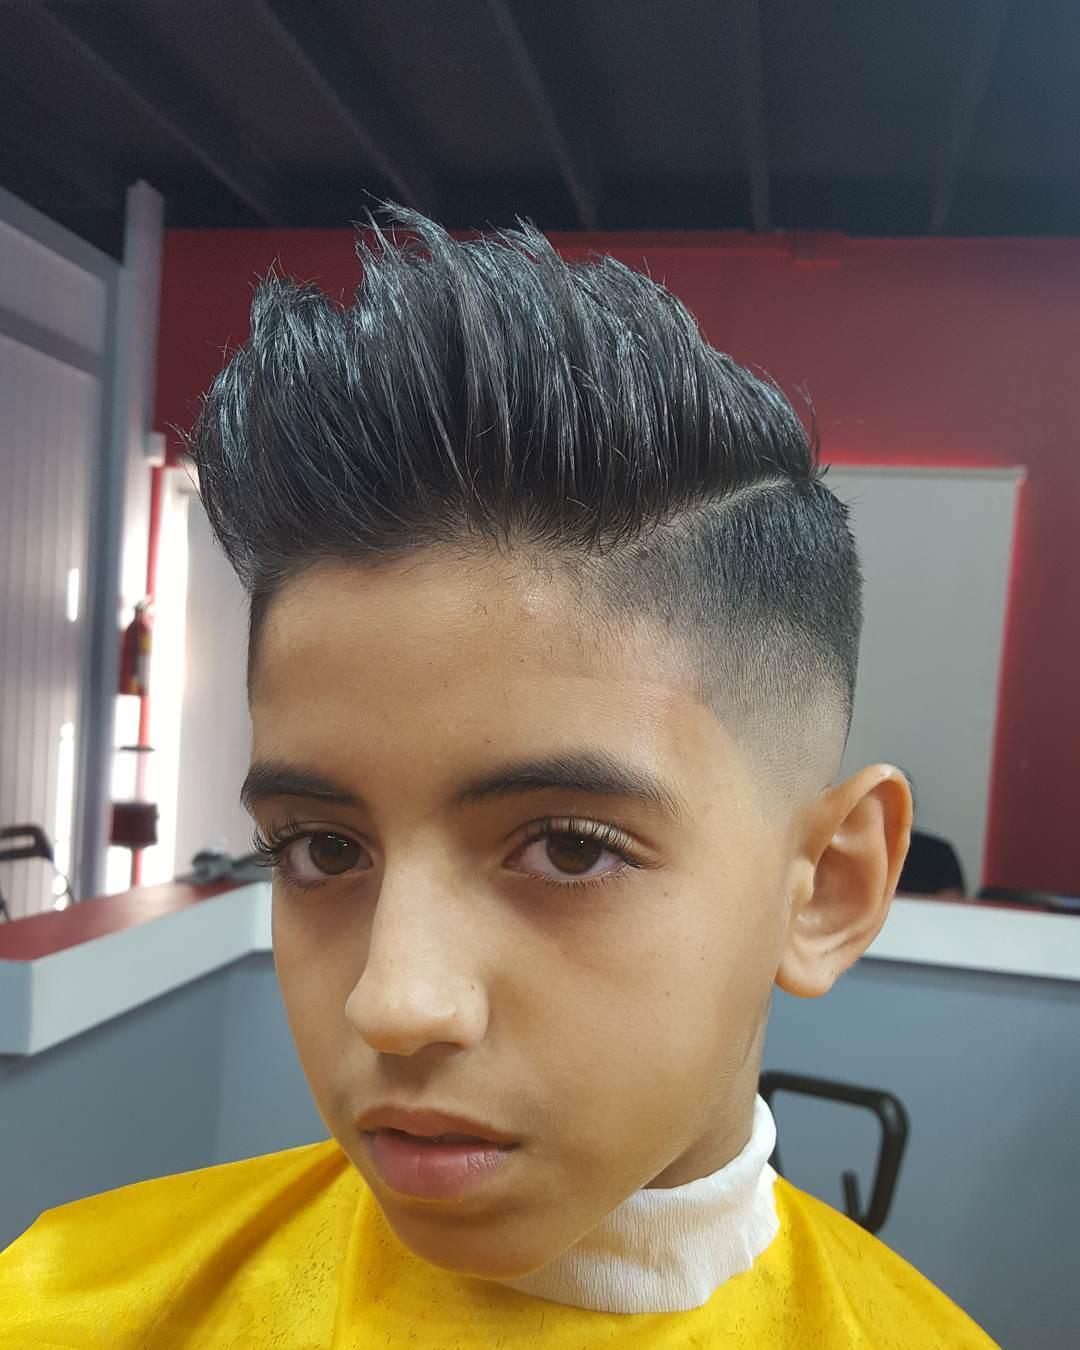 Awe Inspiring 26 Edgy Mohawks Hairstyles For Kids Design Trends Short Hairstyles Gunalazisus